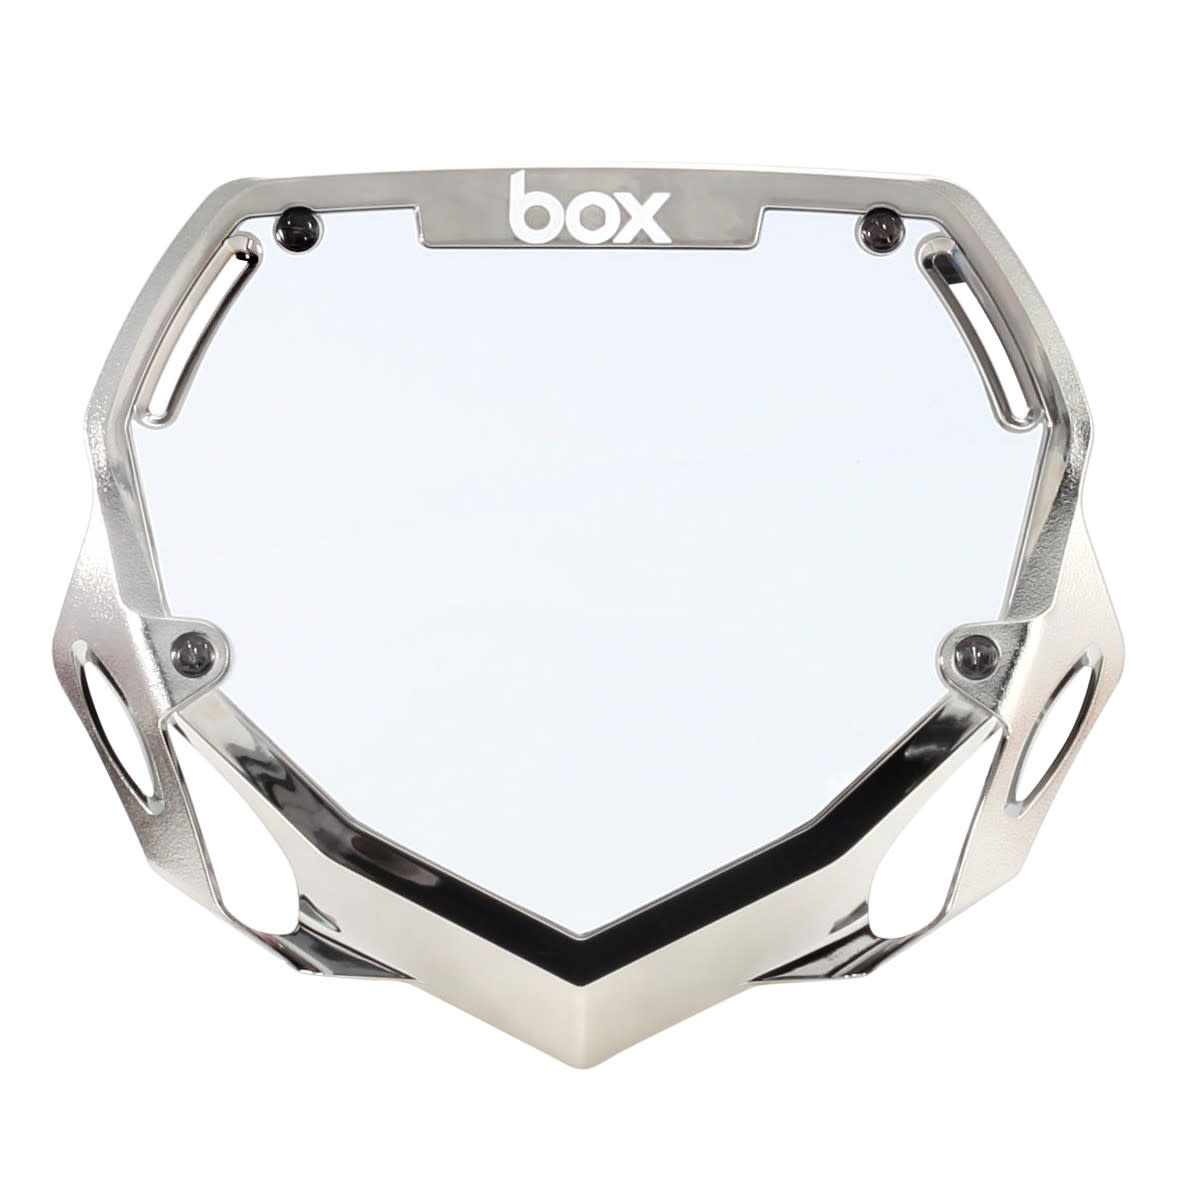 Box Components Box Two Mini Black Chrome Number Plate